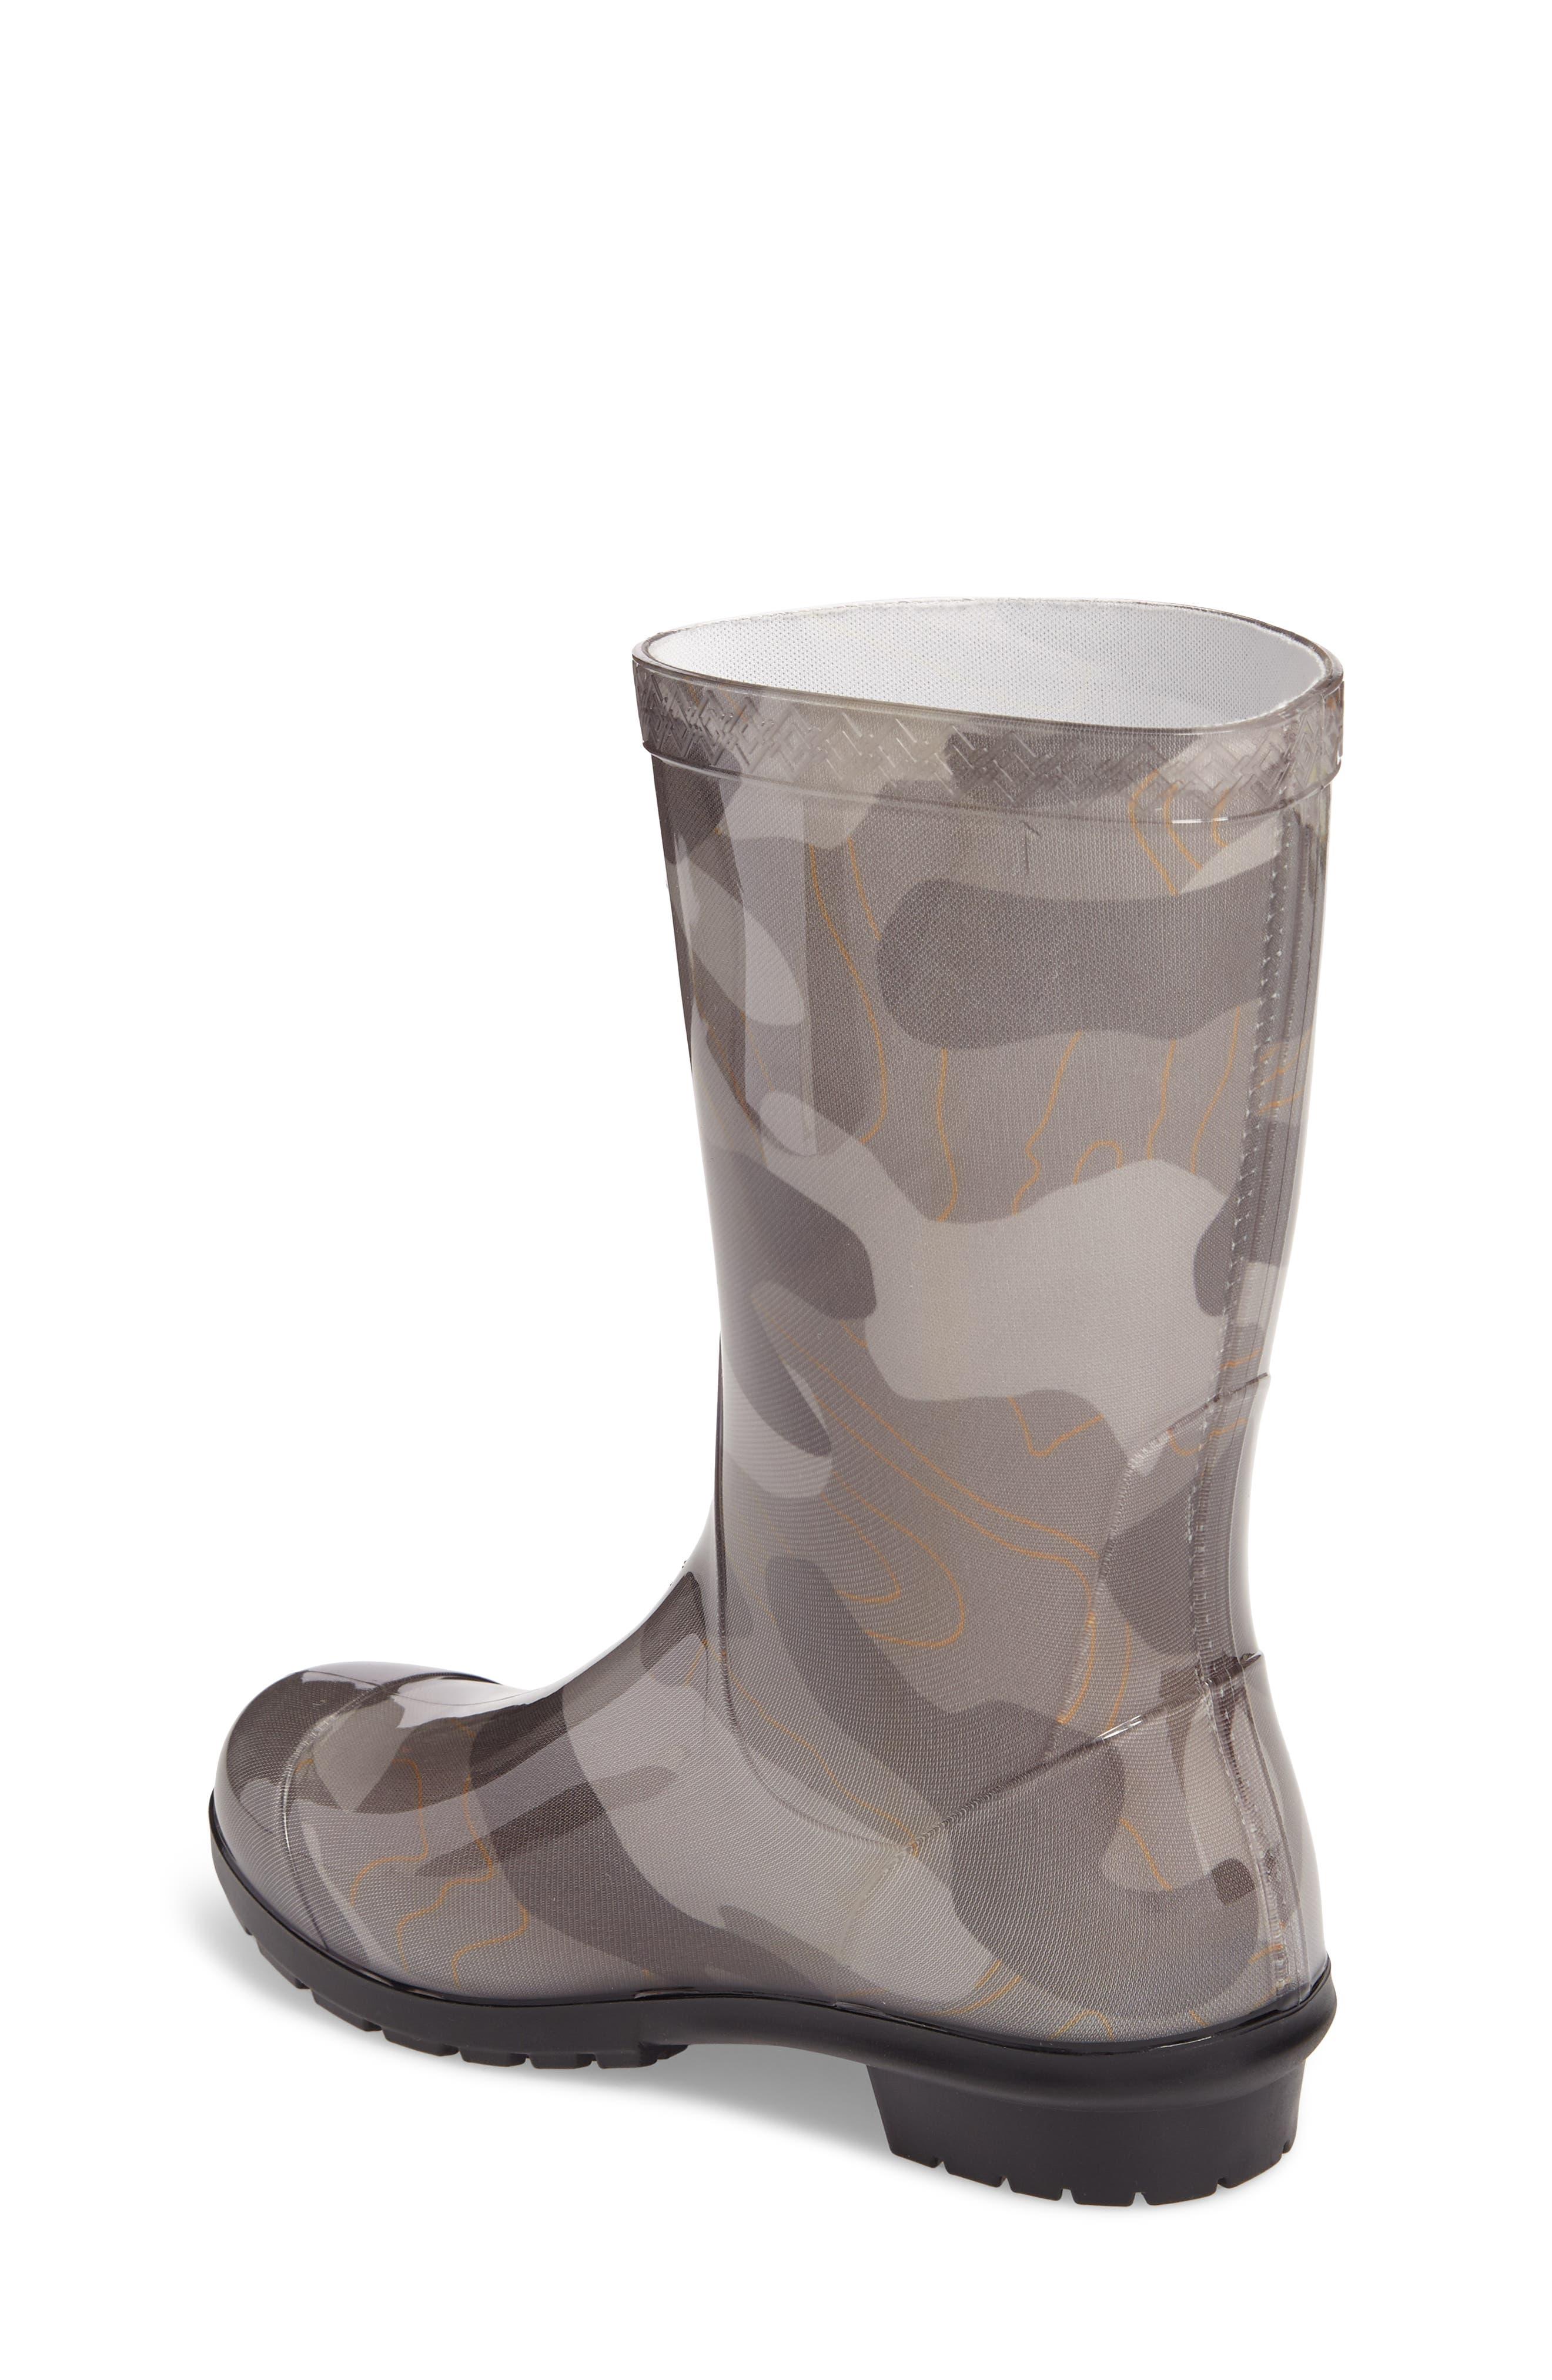 Rahjee Camo Waterproof Rain Boot,                             Alternate thumbnail 2, color,                             020